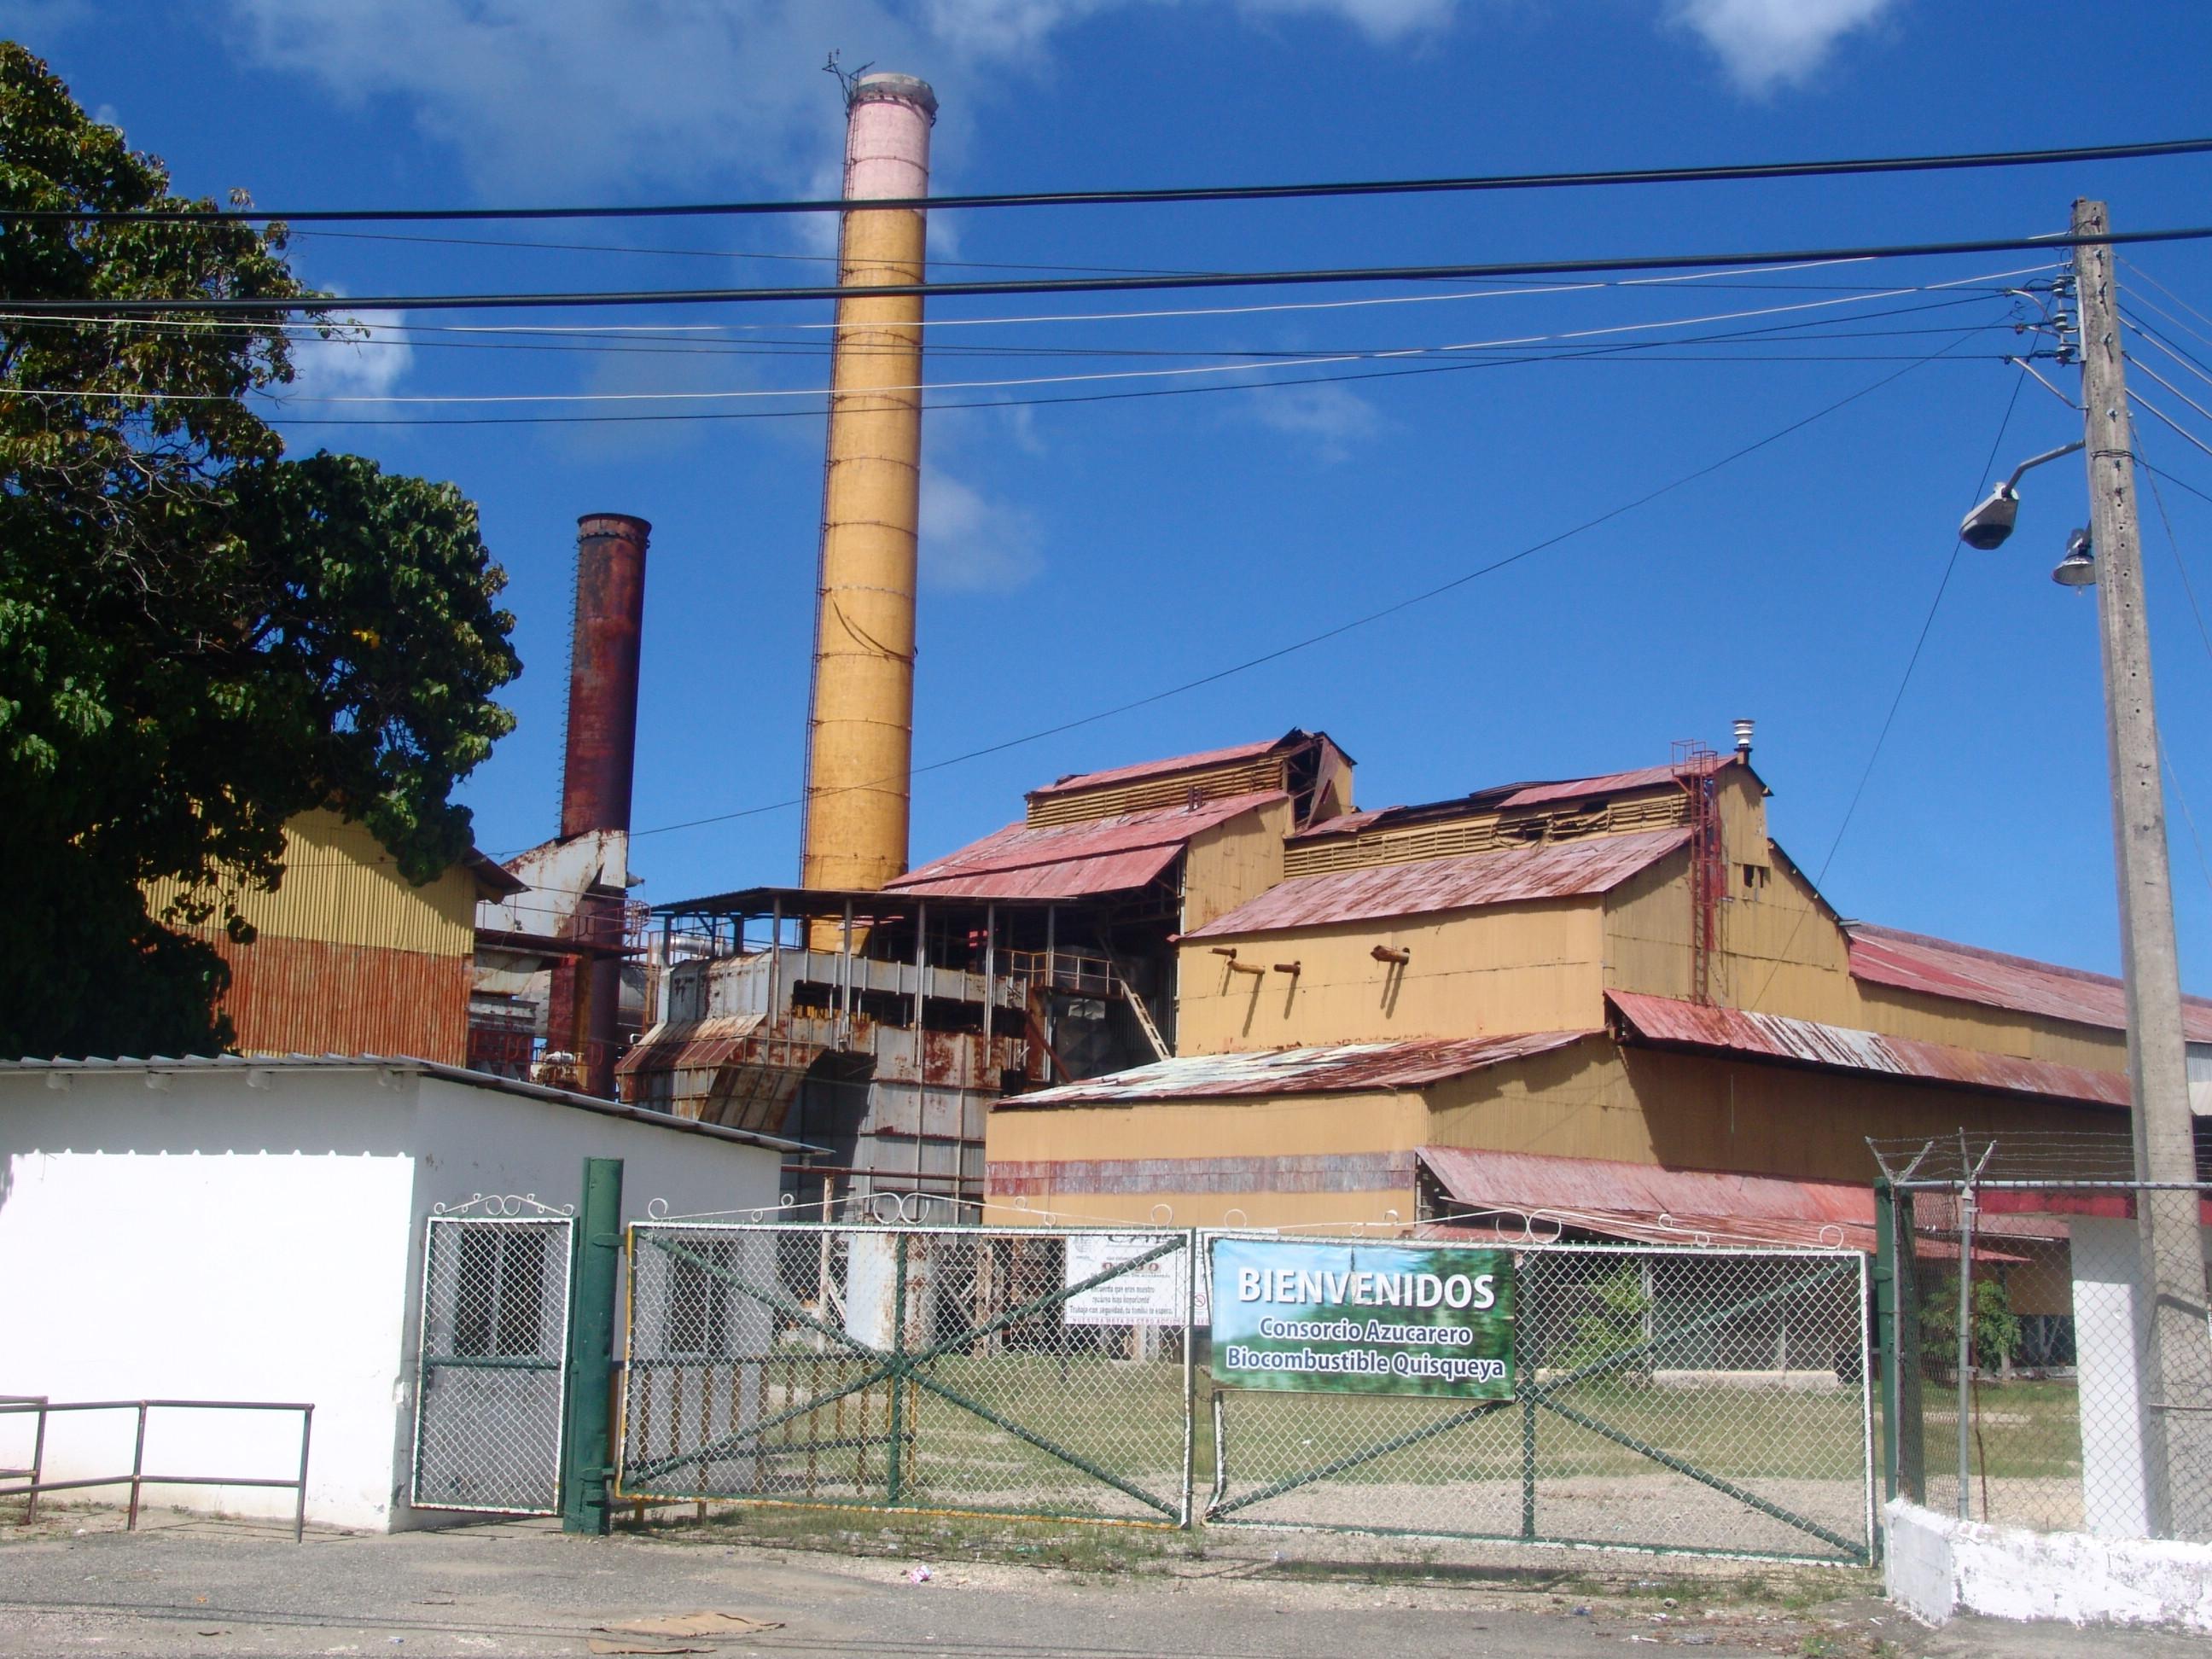 Demandan del presidente Medina reapertura del ingenio Monte Llano